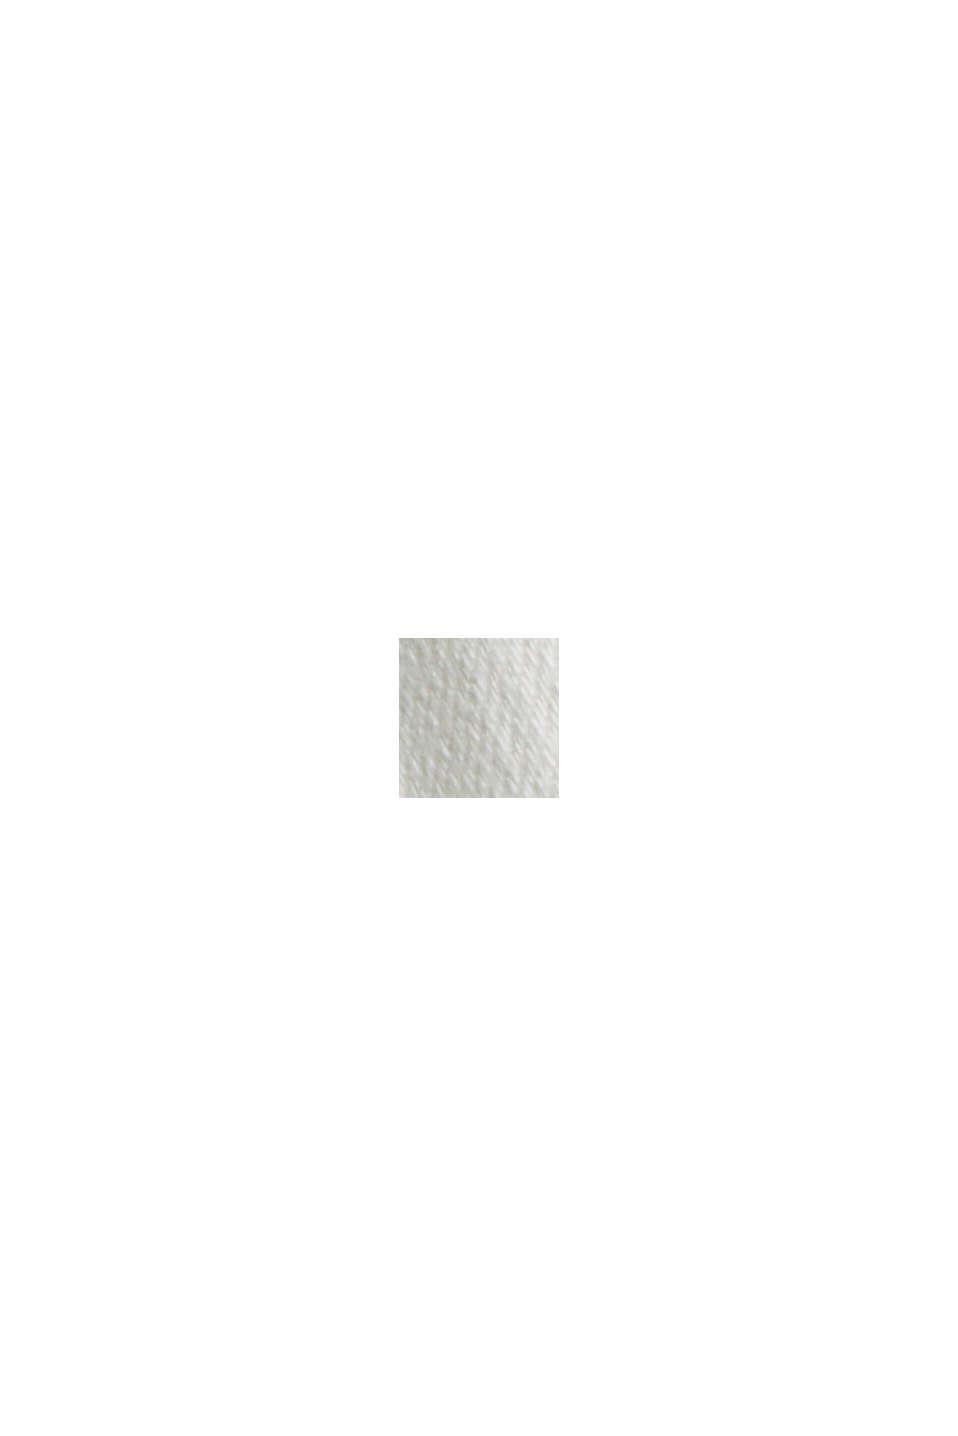 Bermuda shorts made of organic cotton, OFF WHITE, swatch